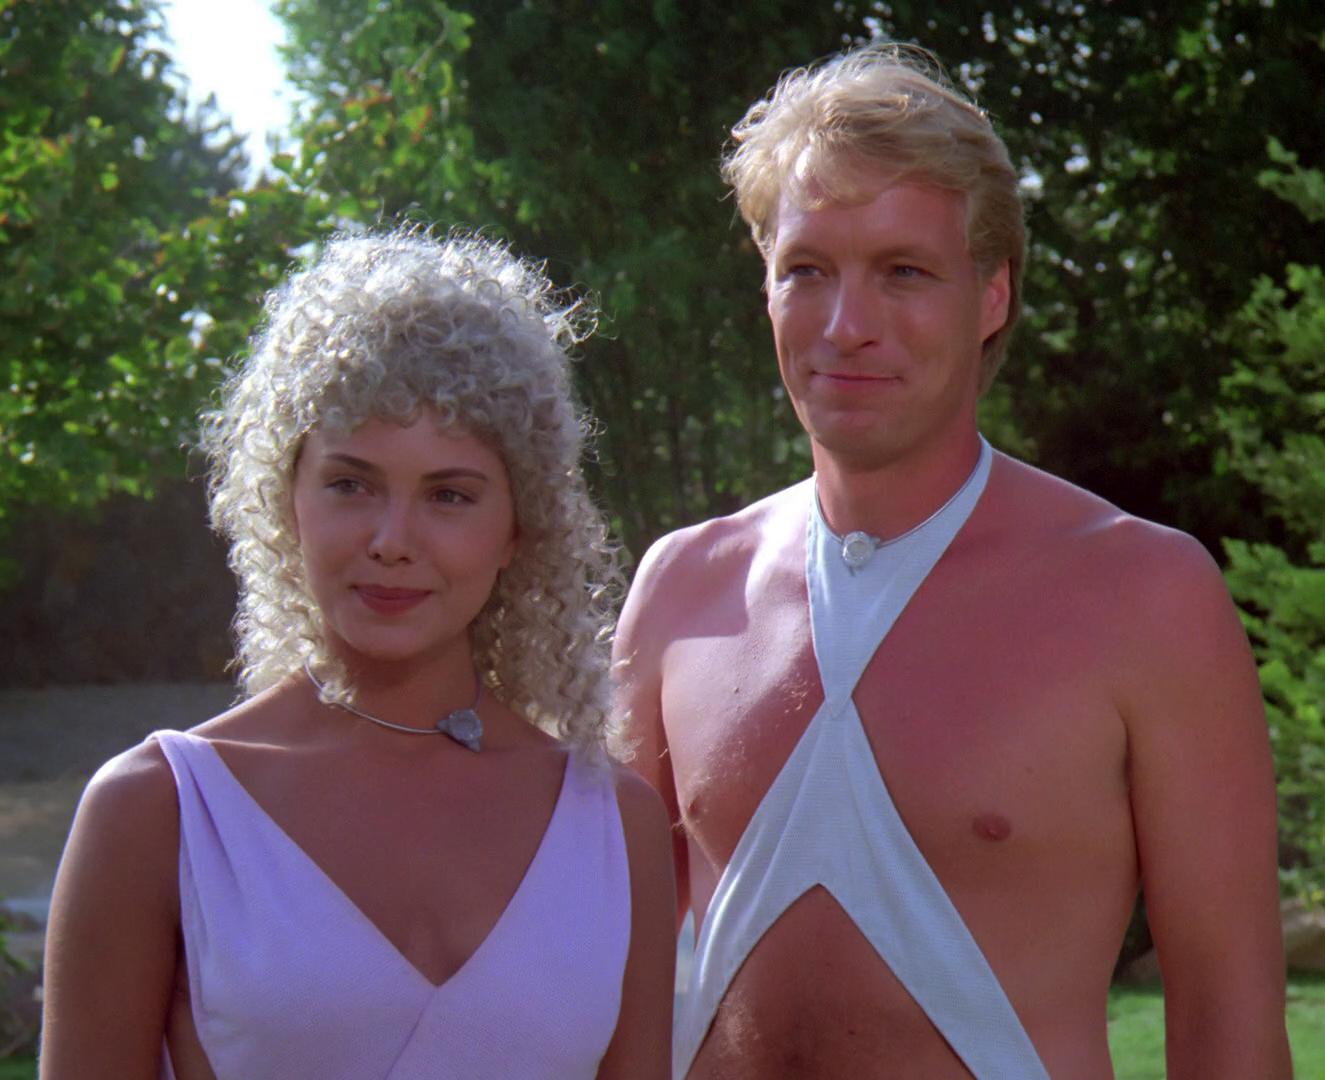 Congratulate, this Star trek episode no adults congratulate, what